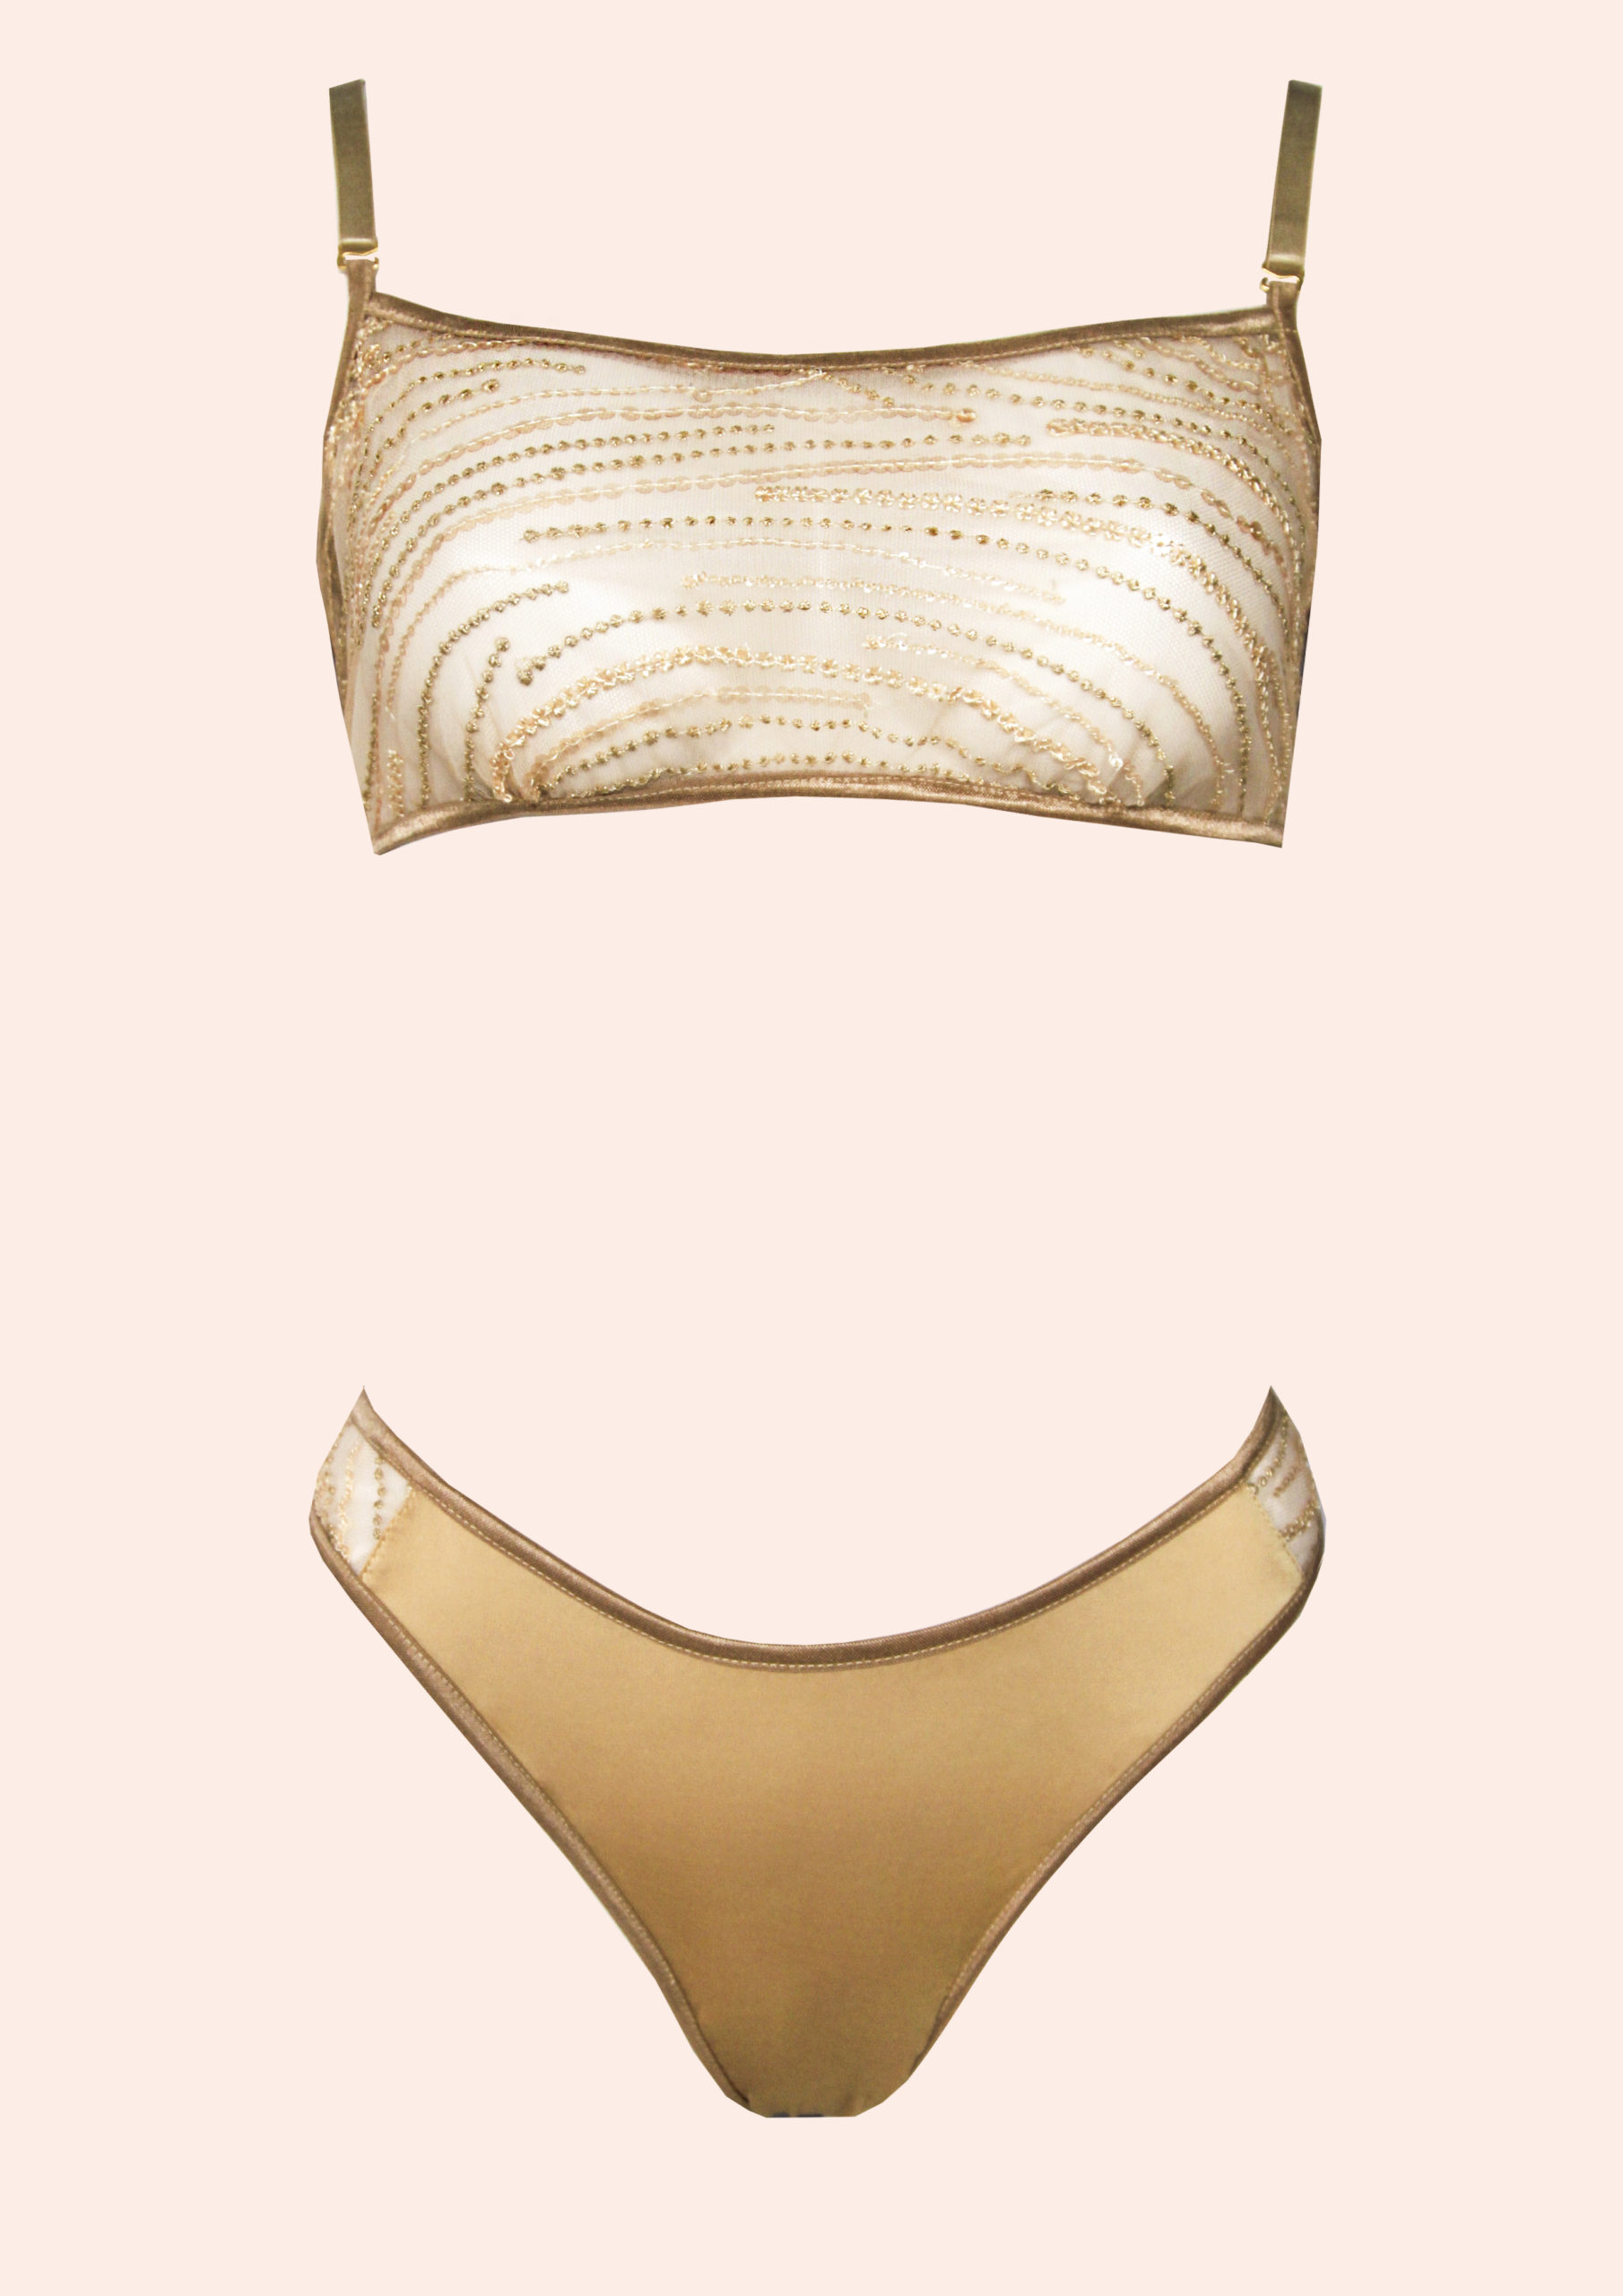 Gold sparkle new lingerie art fashion style